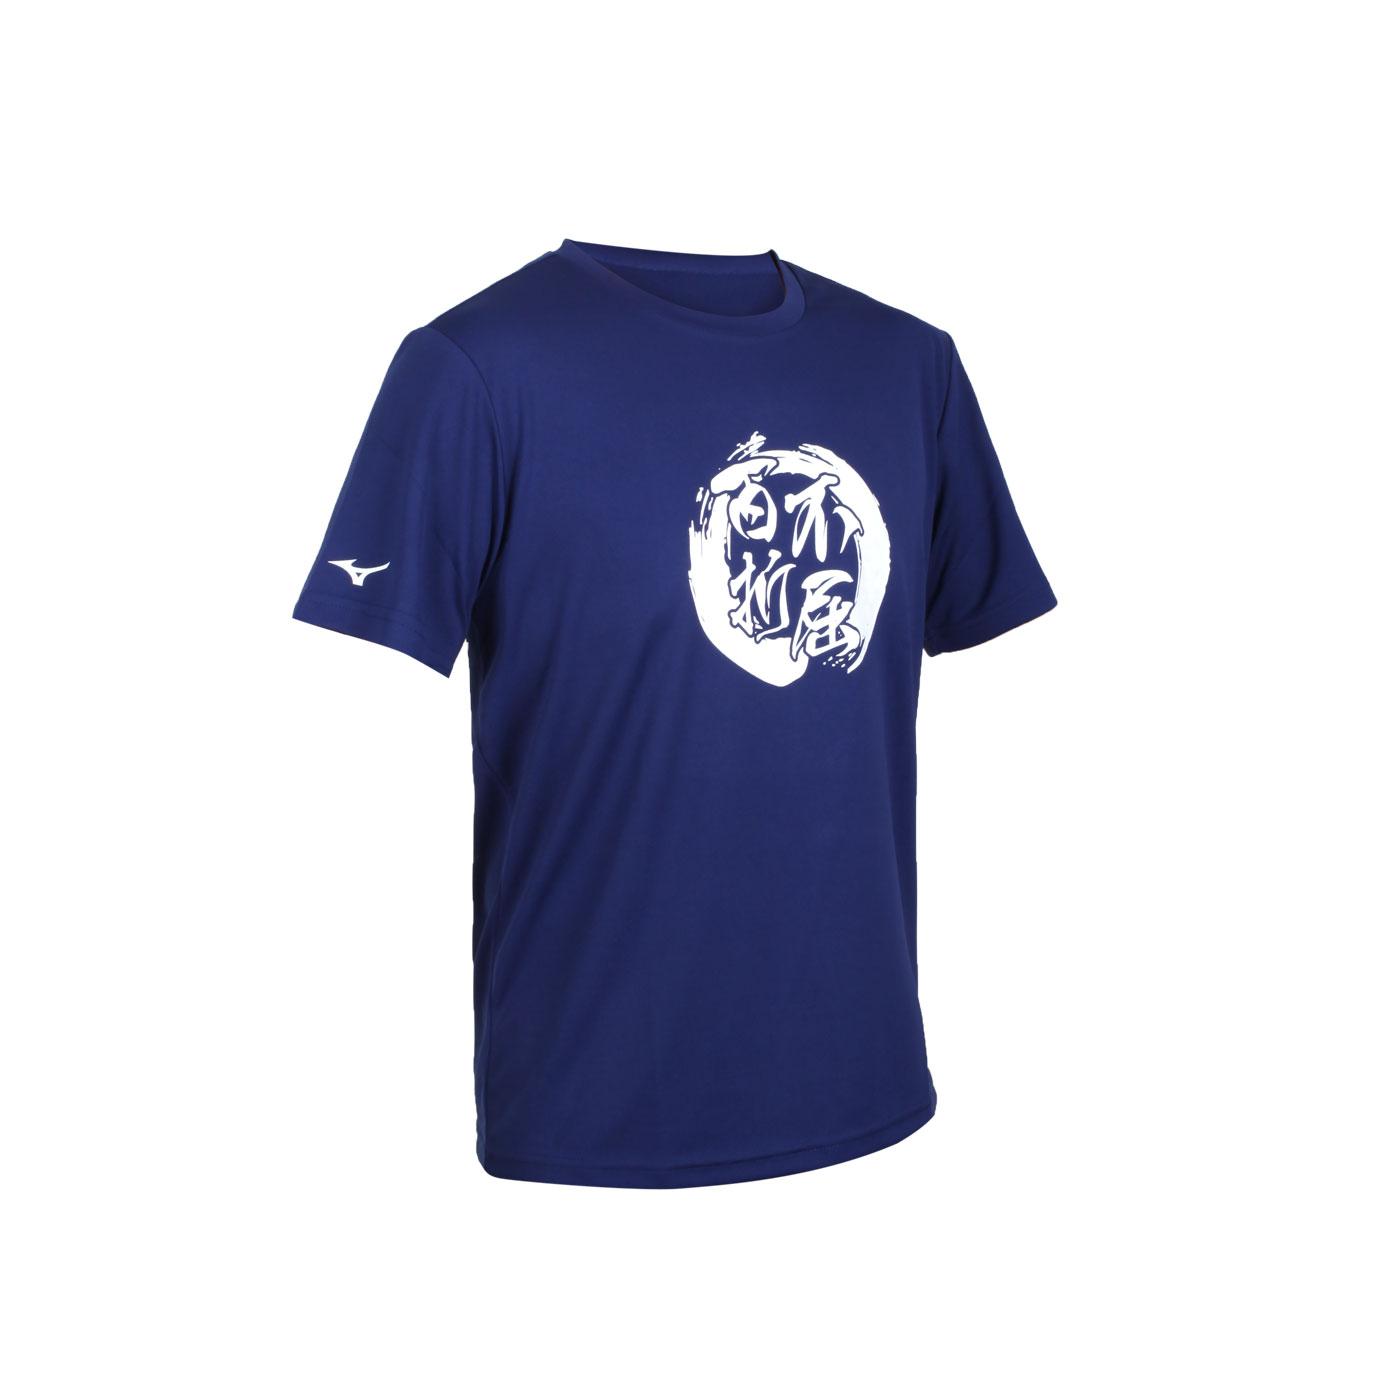 MIZUNO 男款短袖T恤 32TA101122 - 深藍白